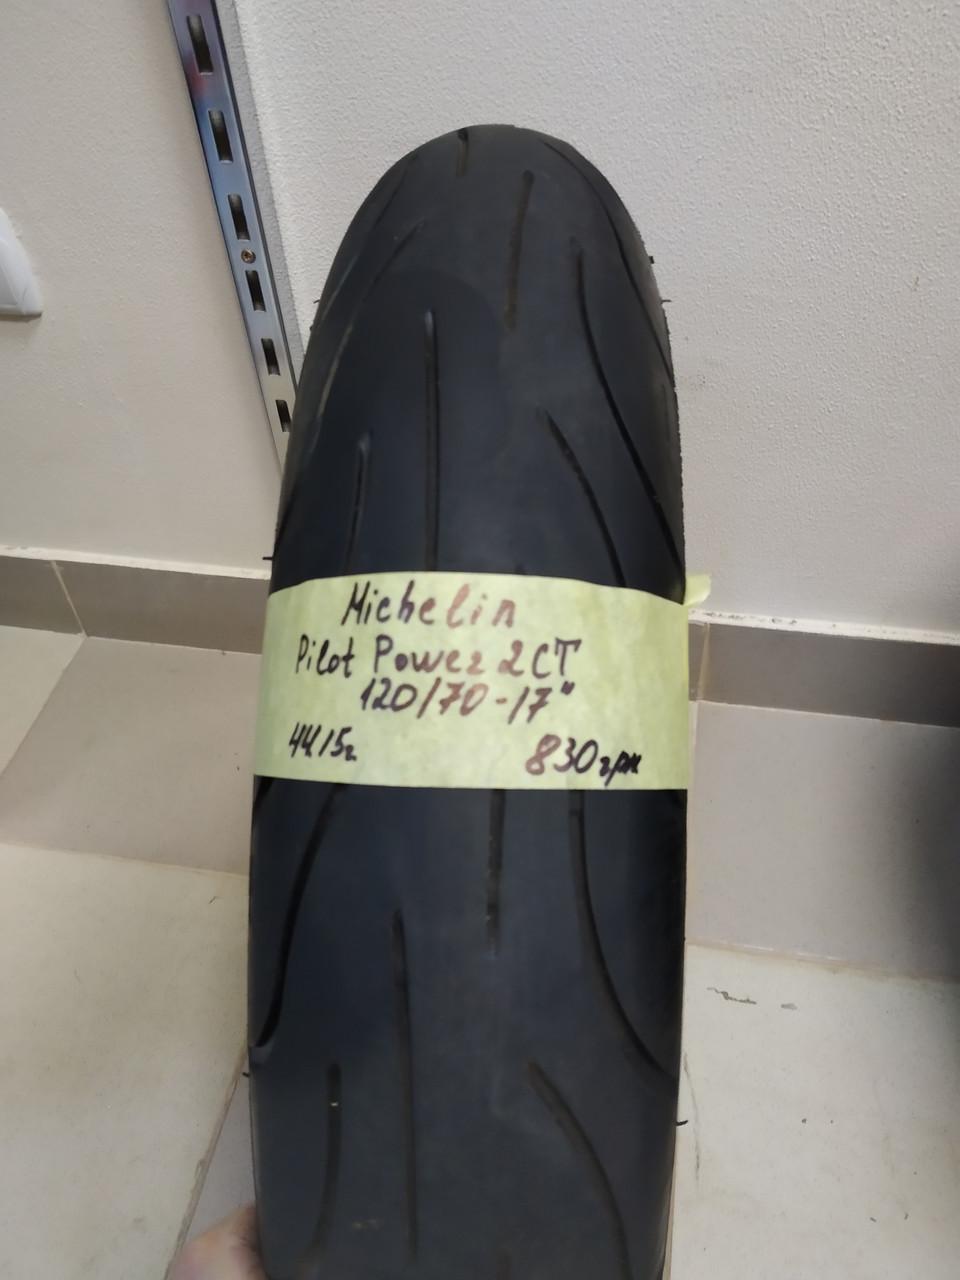 Michelin Pilot Power 2ct 120 70 17 (44.15) Мото резина покрышка колесо